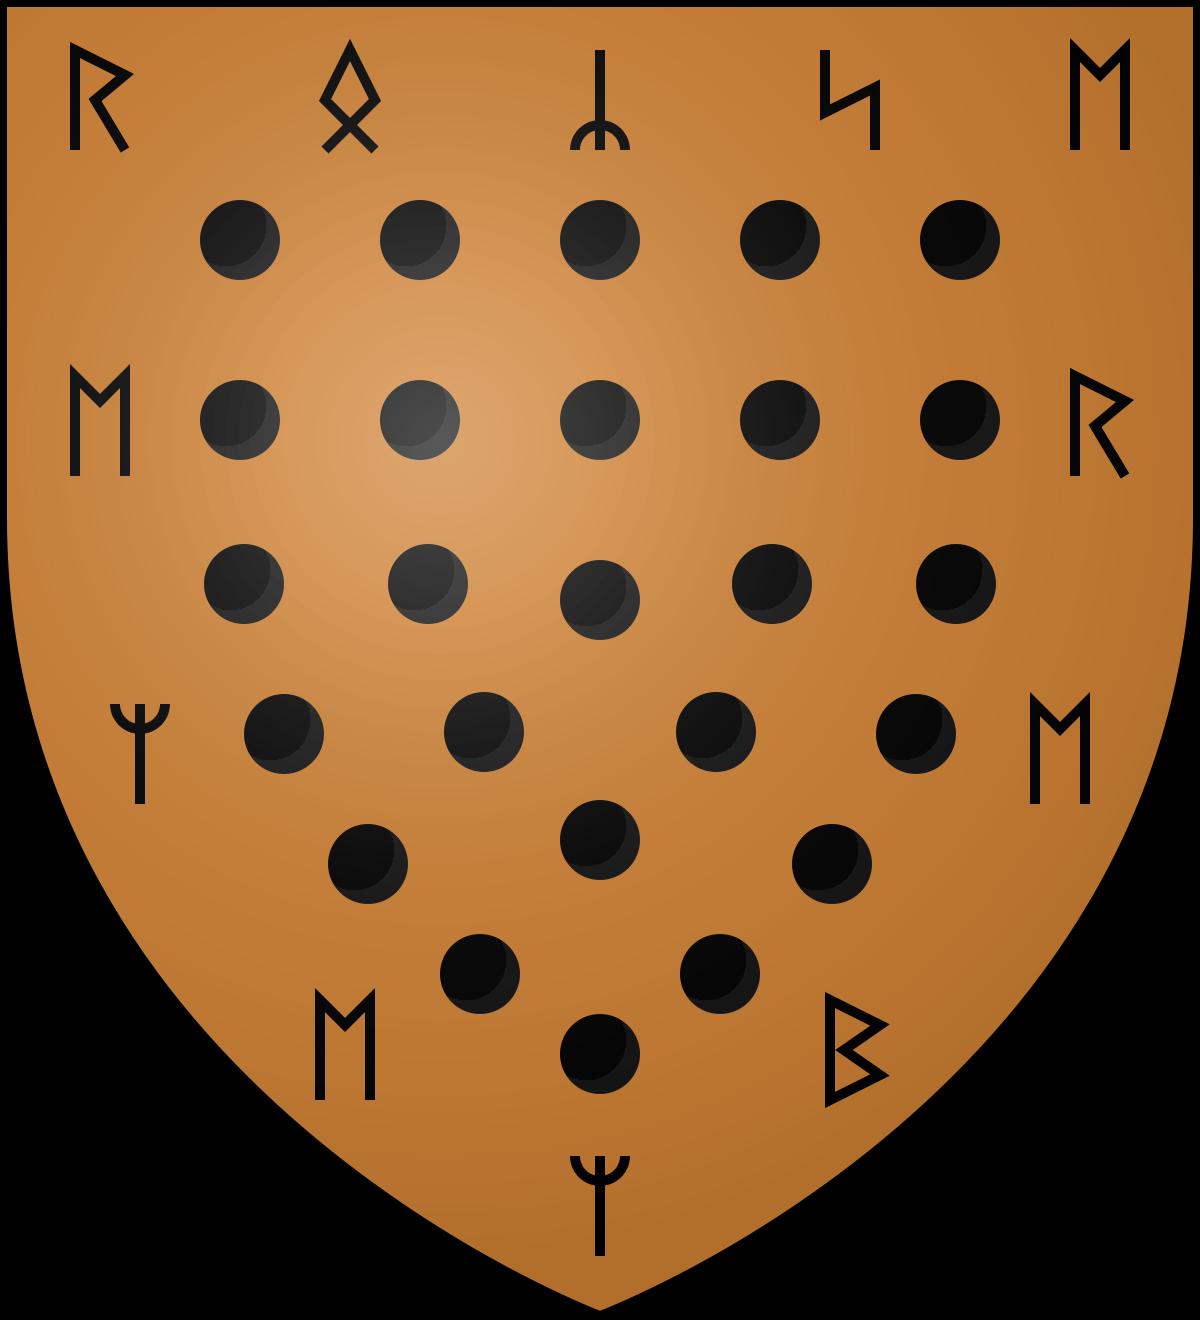 stemma-royce